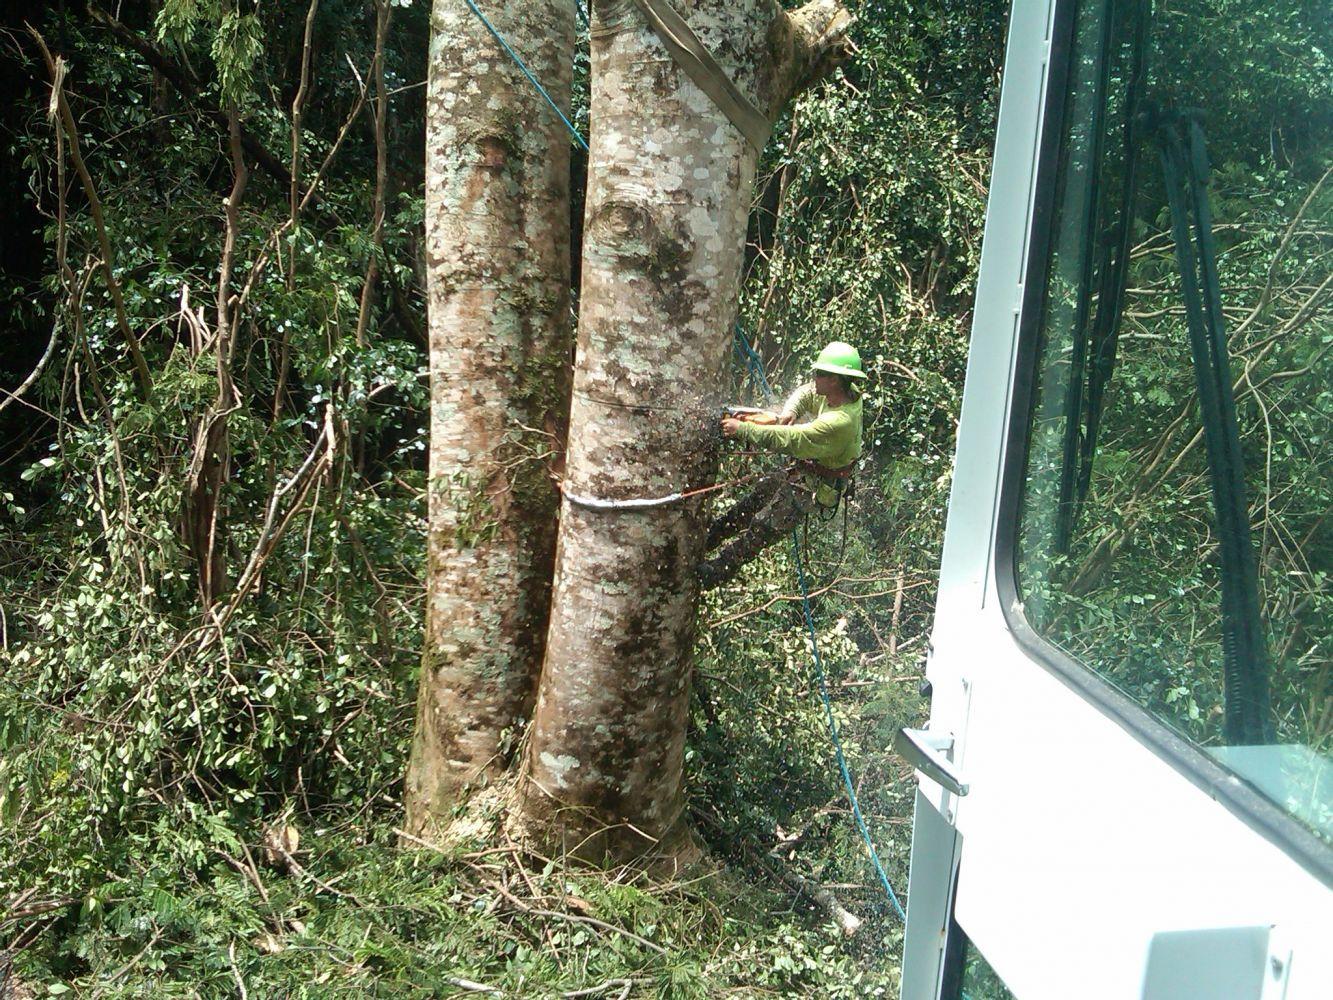 Tree trimming underway in Hilo, HI